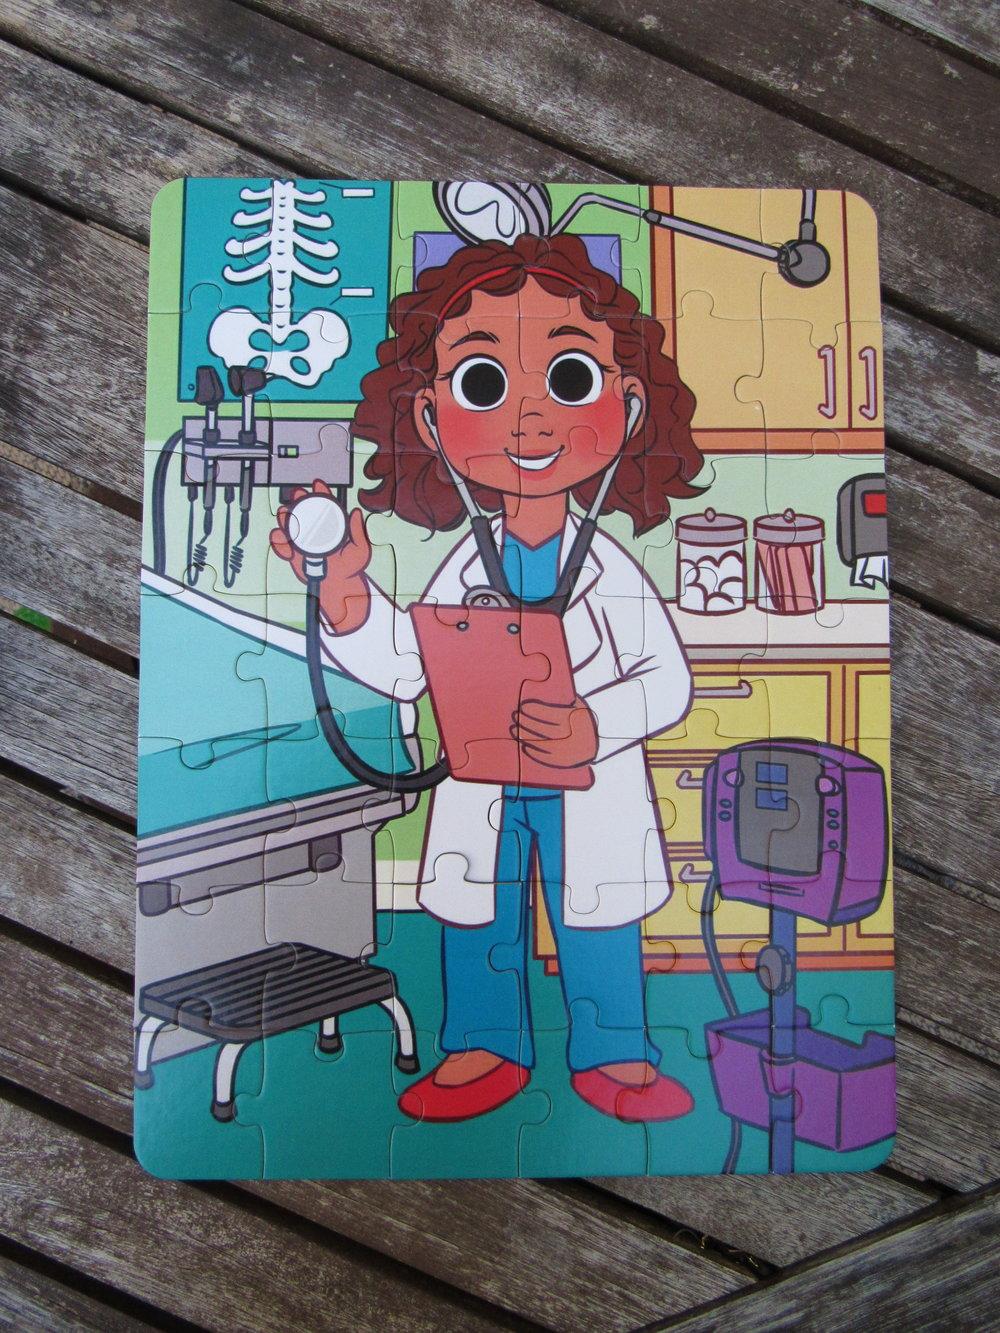 Doctor Puzzle #medicalplaygiftguide #doseofplay #puzzle #kidpuzzle #preschoolgiftguide #toddlers #preschoolers #threeyearsold #fouryearsold #fiveyearsold #doctor #doctortoy #futuredoctor #diversecharacters #diversity #diversetoy #multiculturaltoy